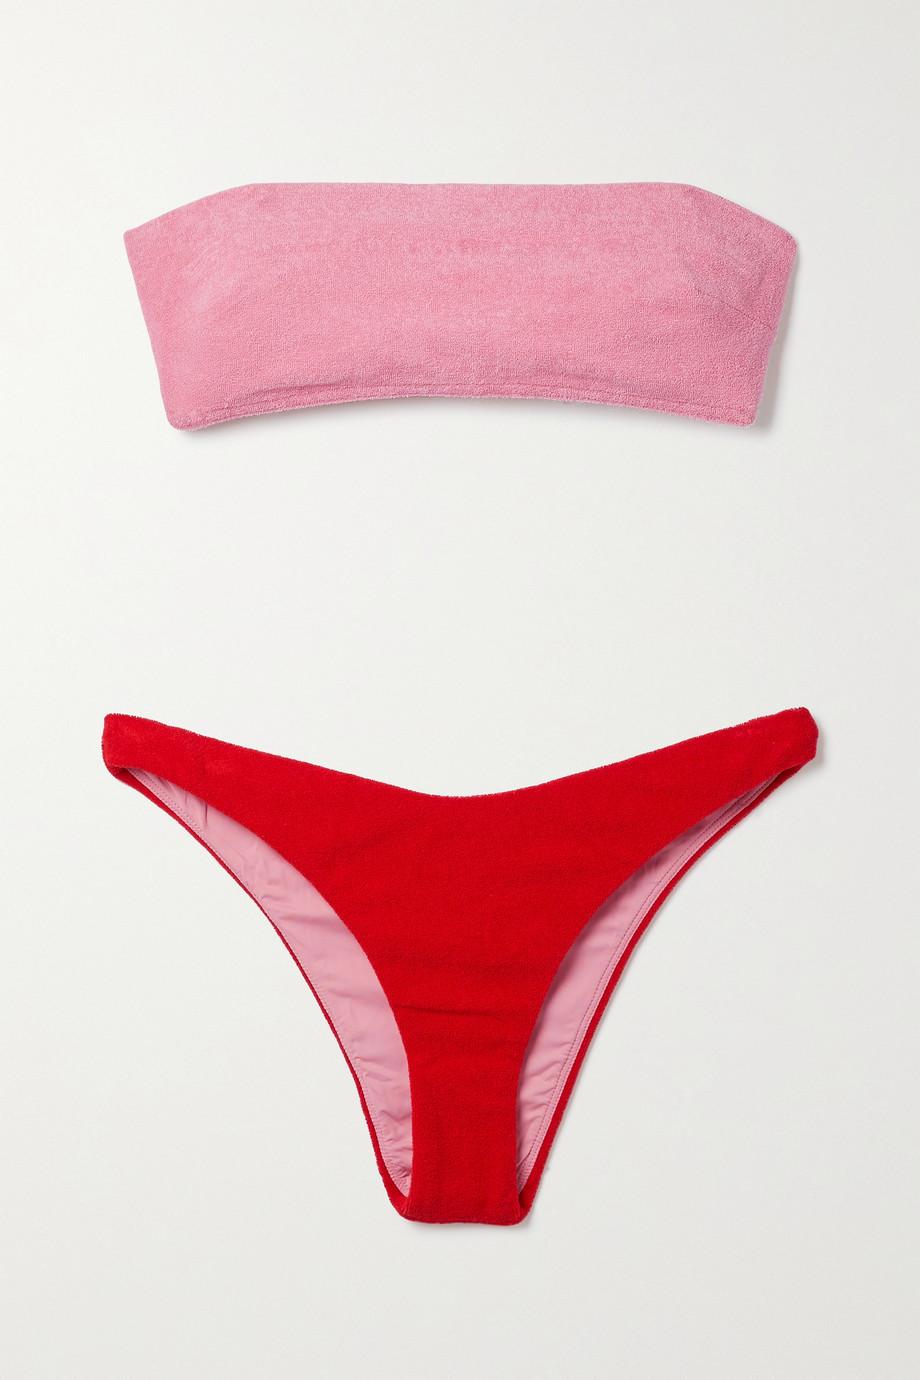 Zimmermann Bikini bandeau en molleton de coton mélangé bicolore Poppy